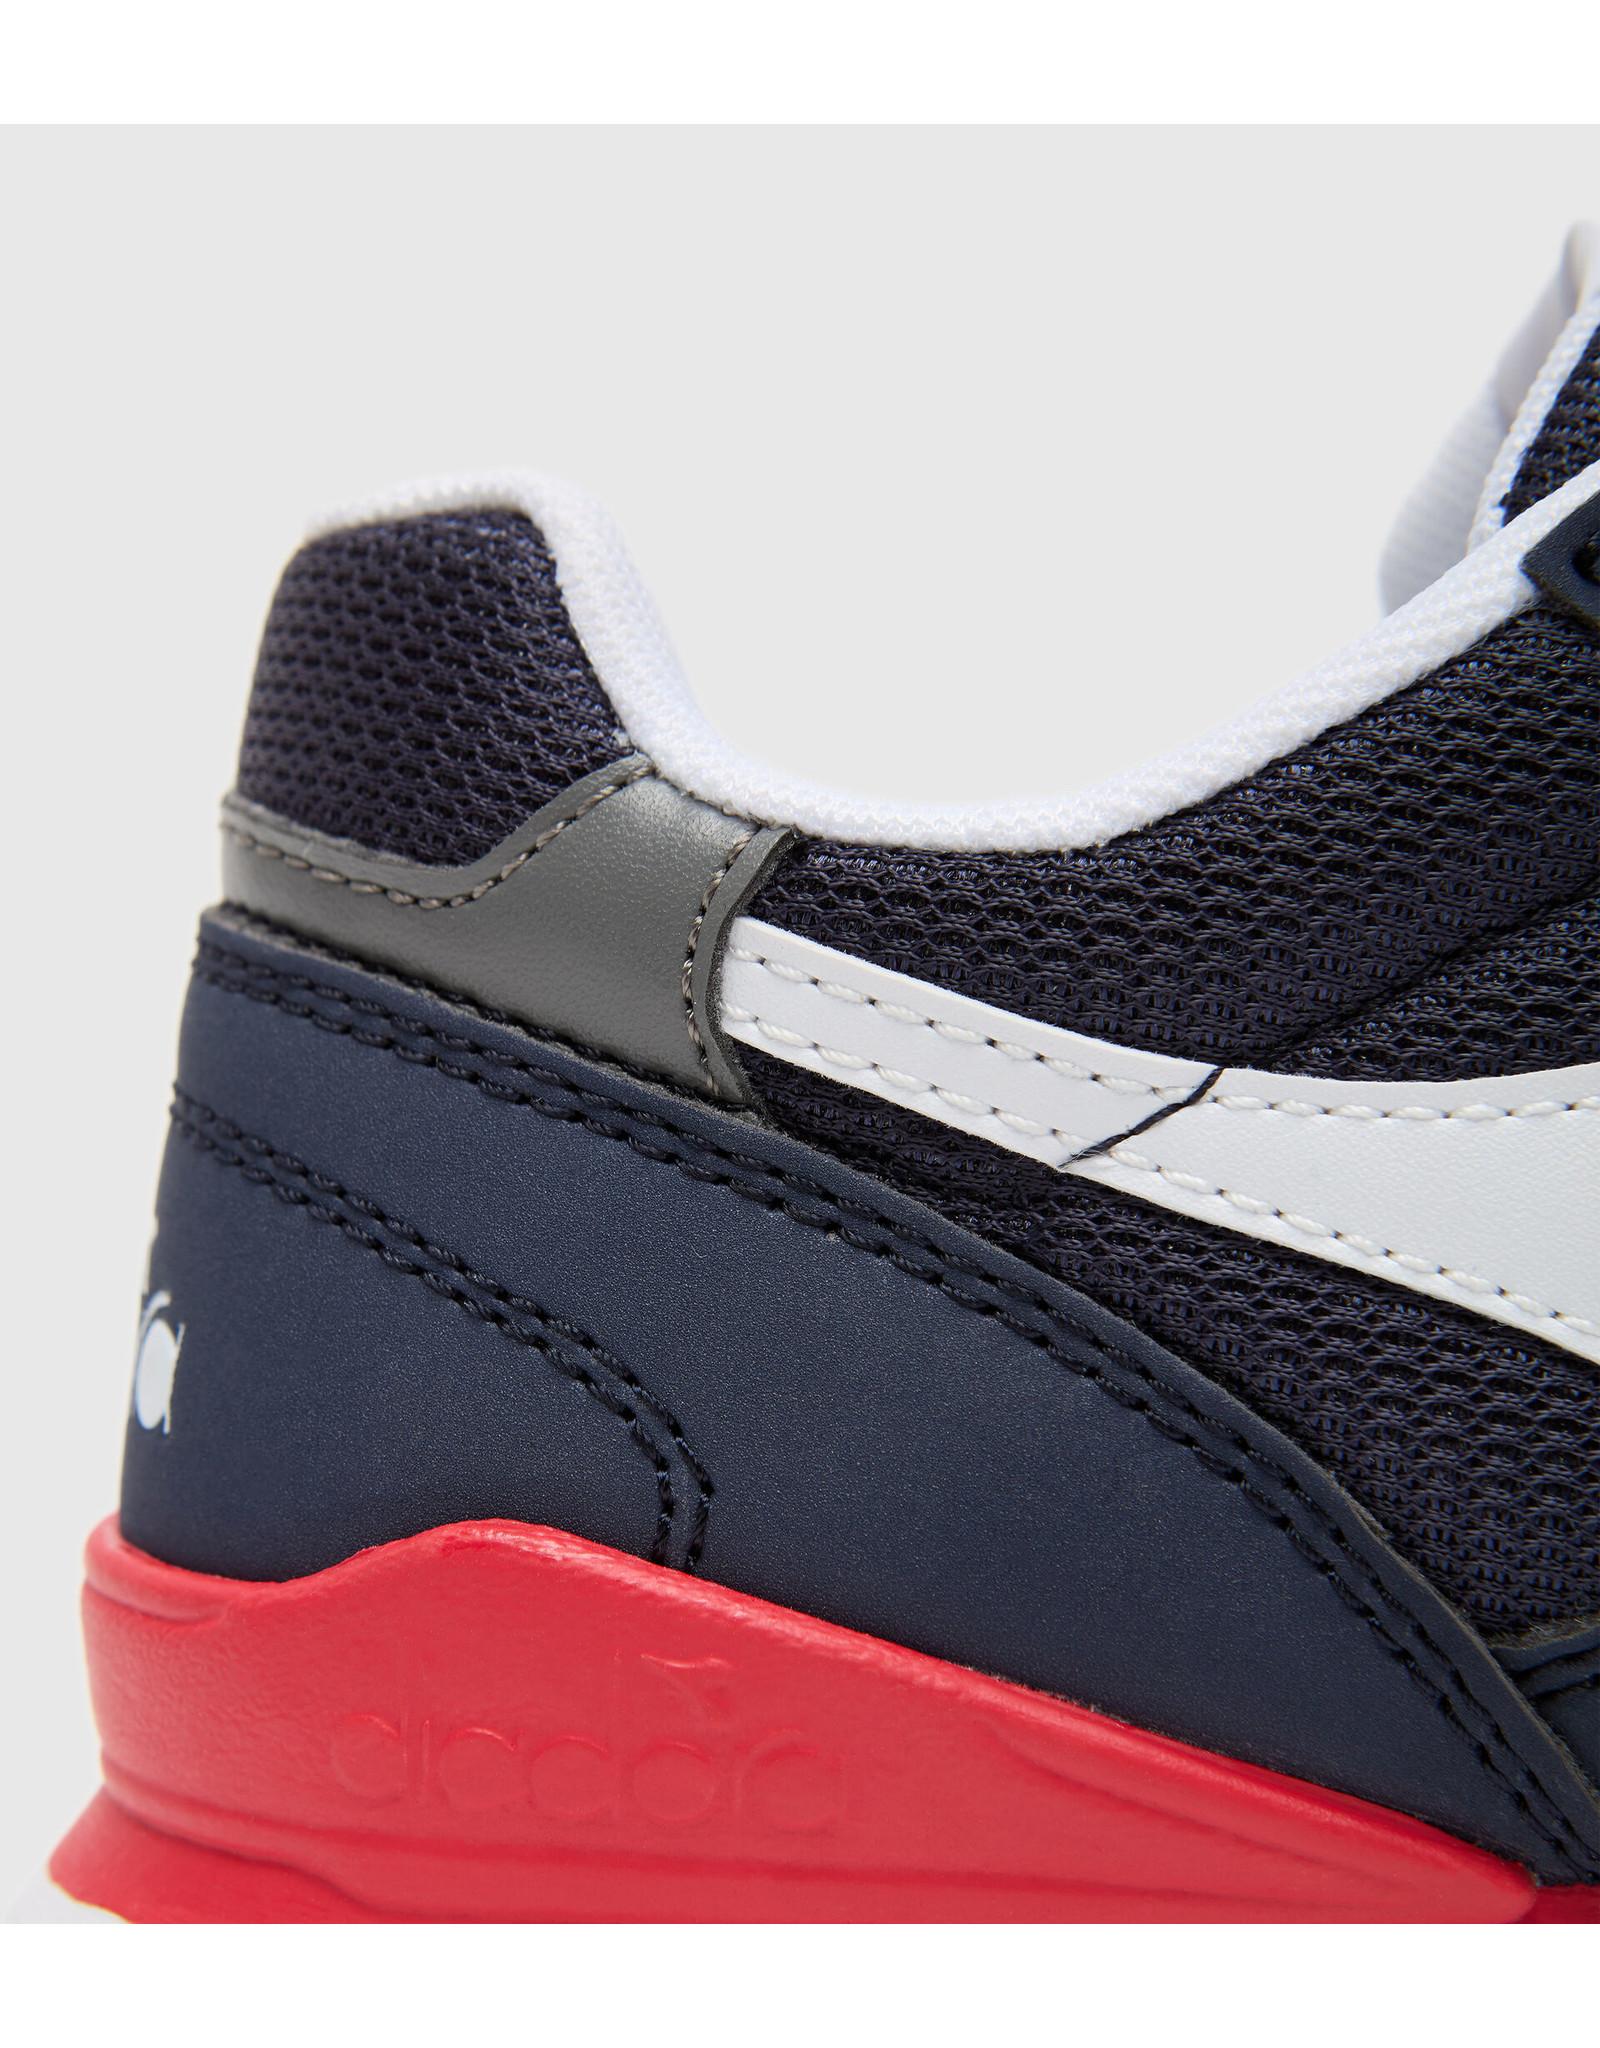 Diadora sneaker blauw rood